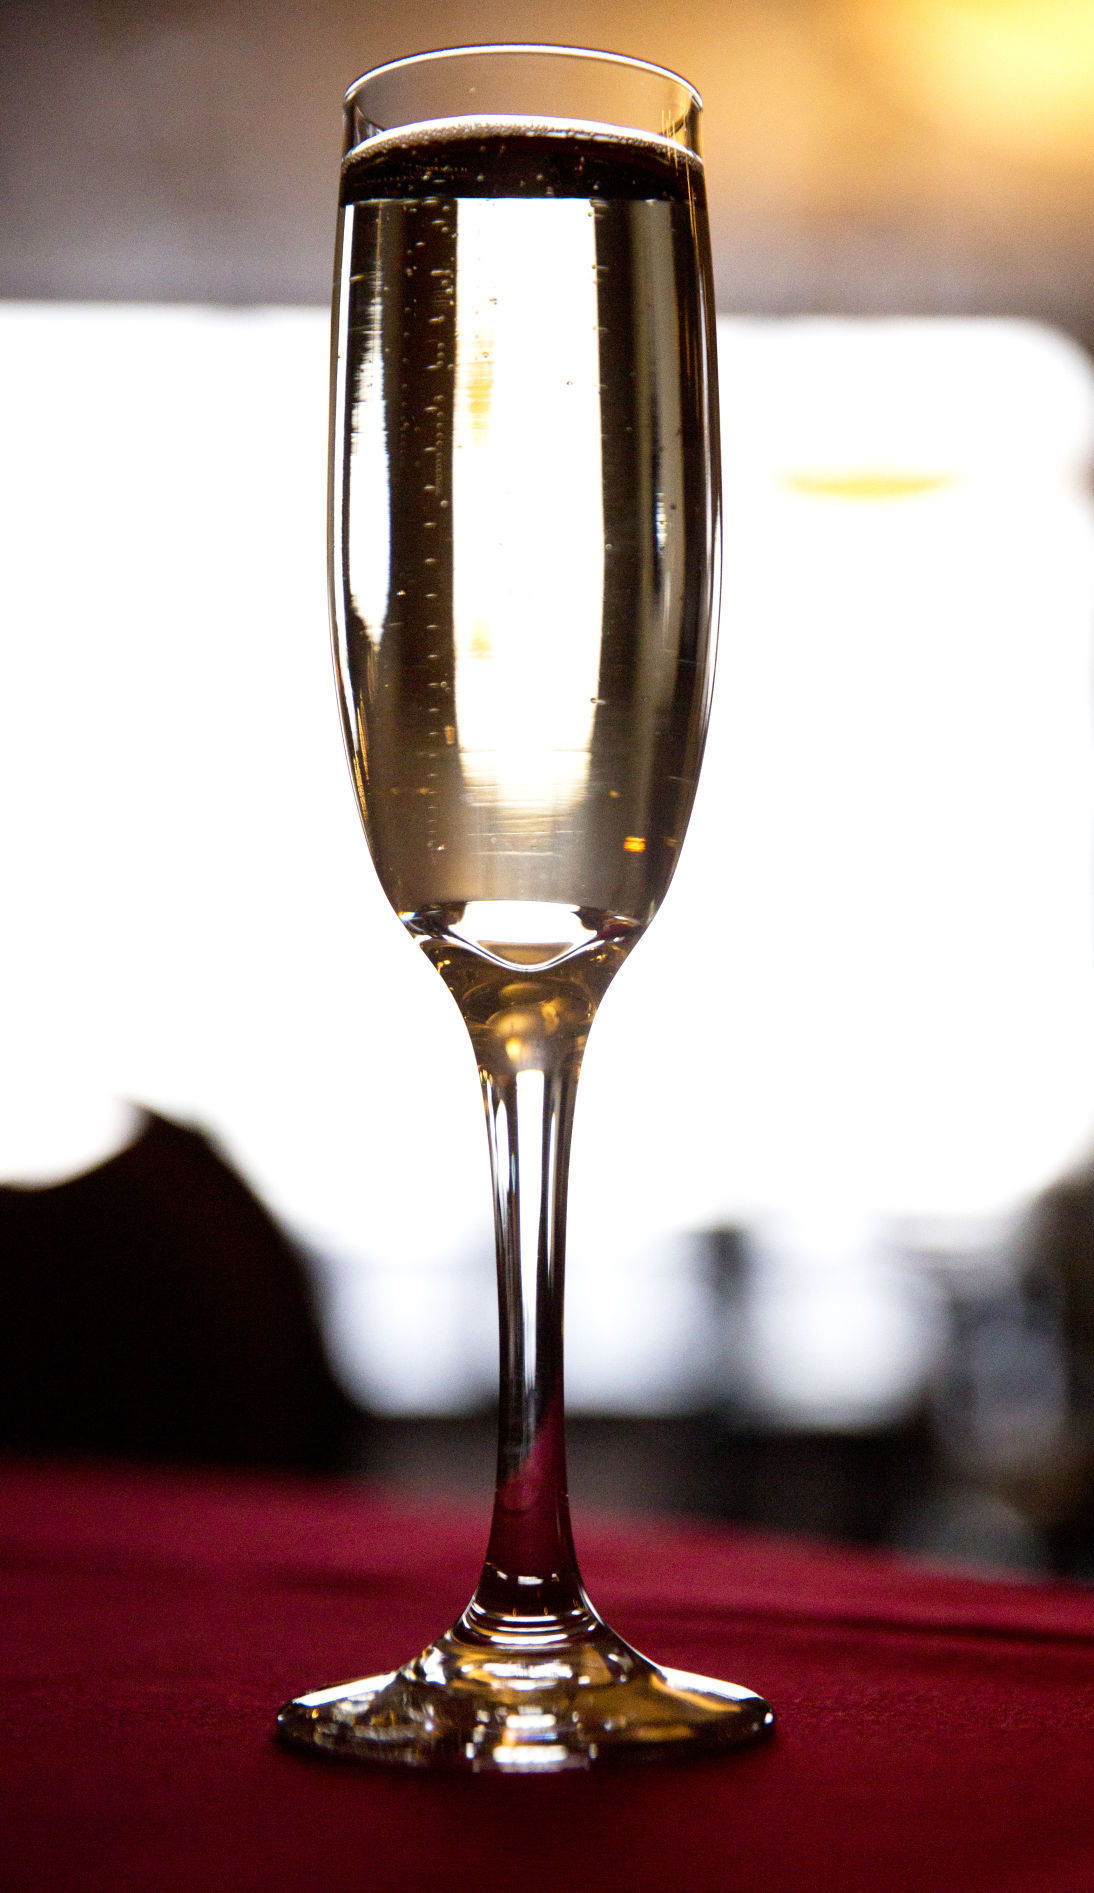 9 ways to wine and dine your Valentine